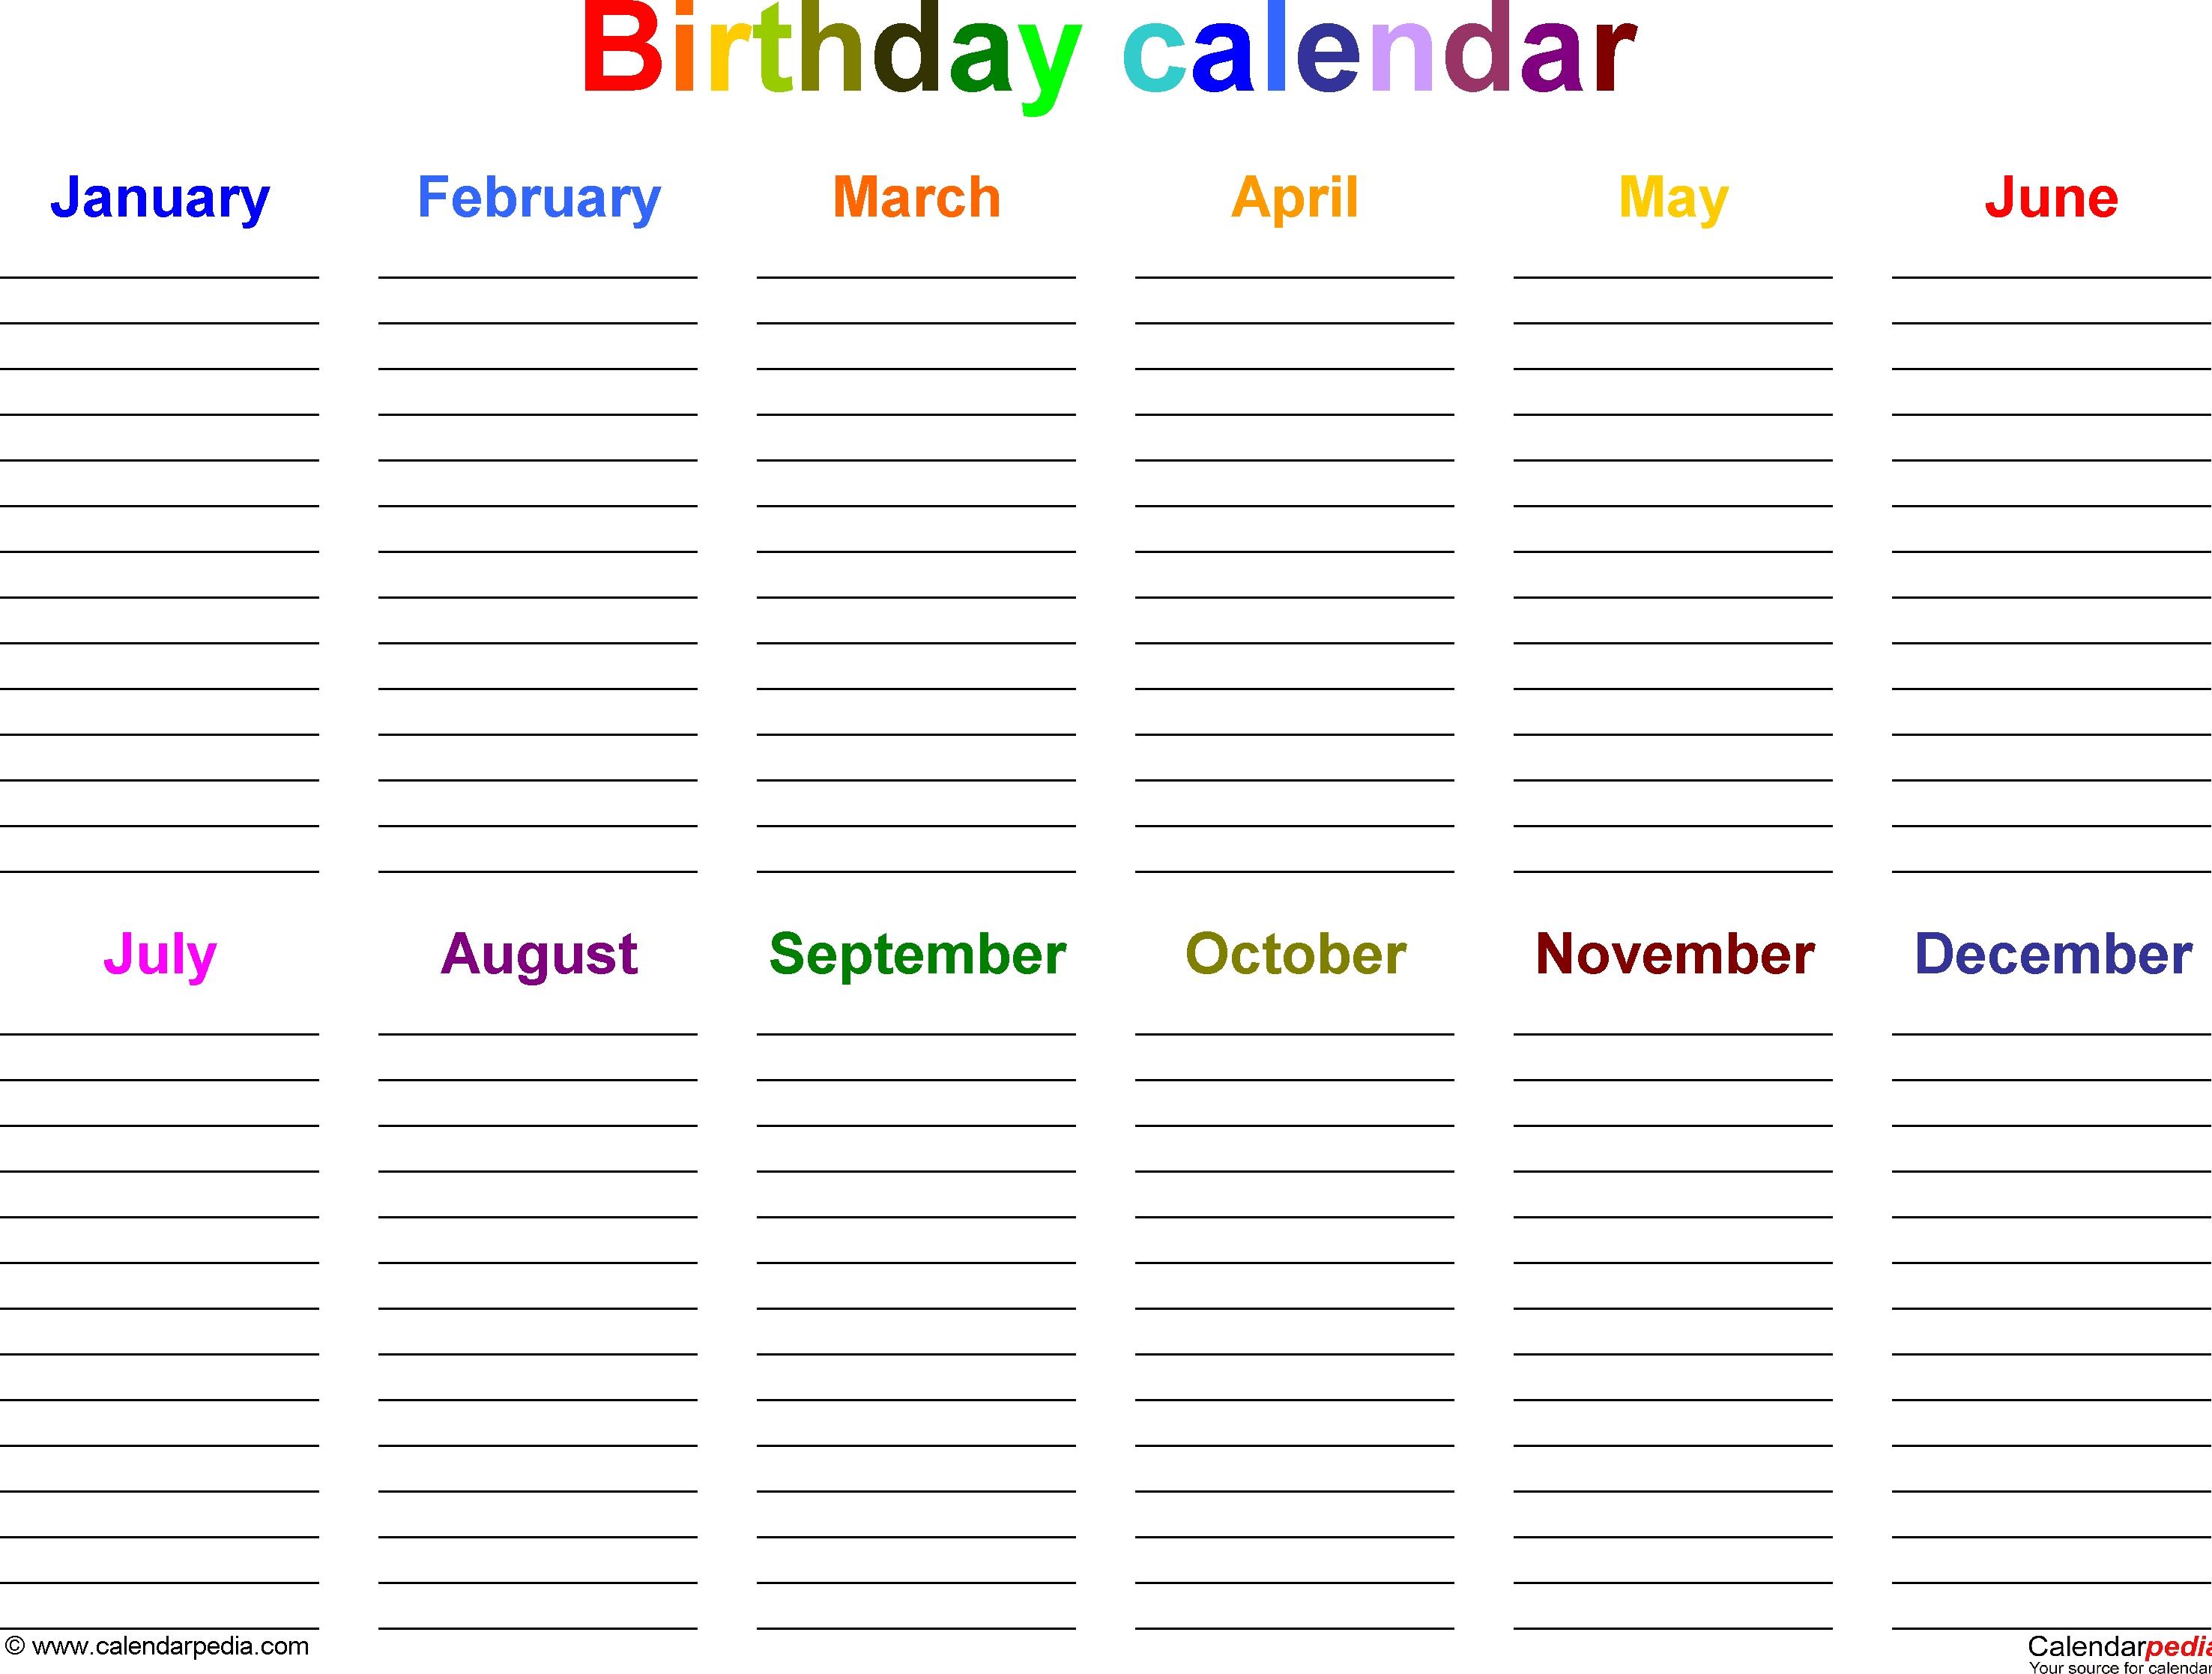 Birthday Calendars 7 Free Printable Word Templates